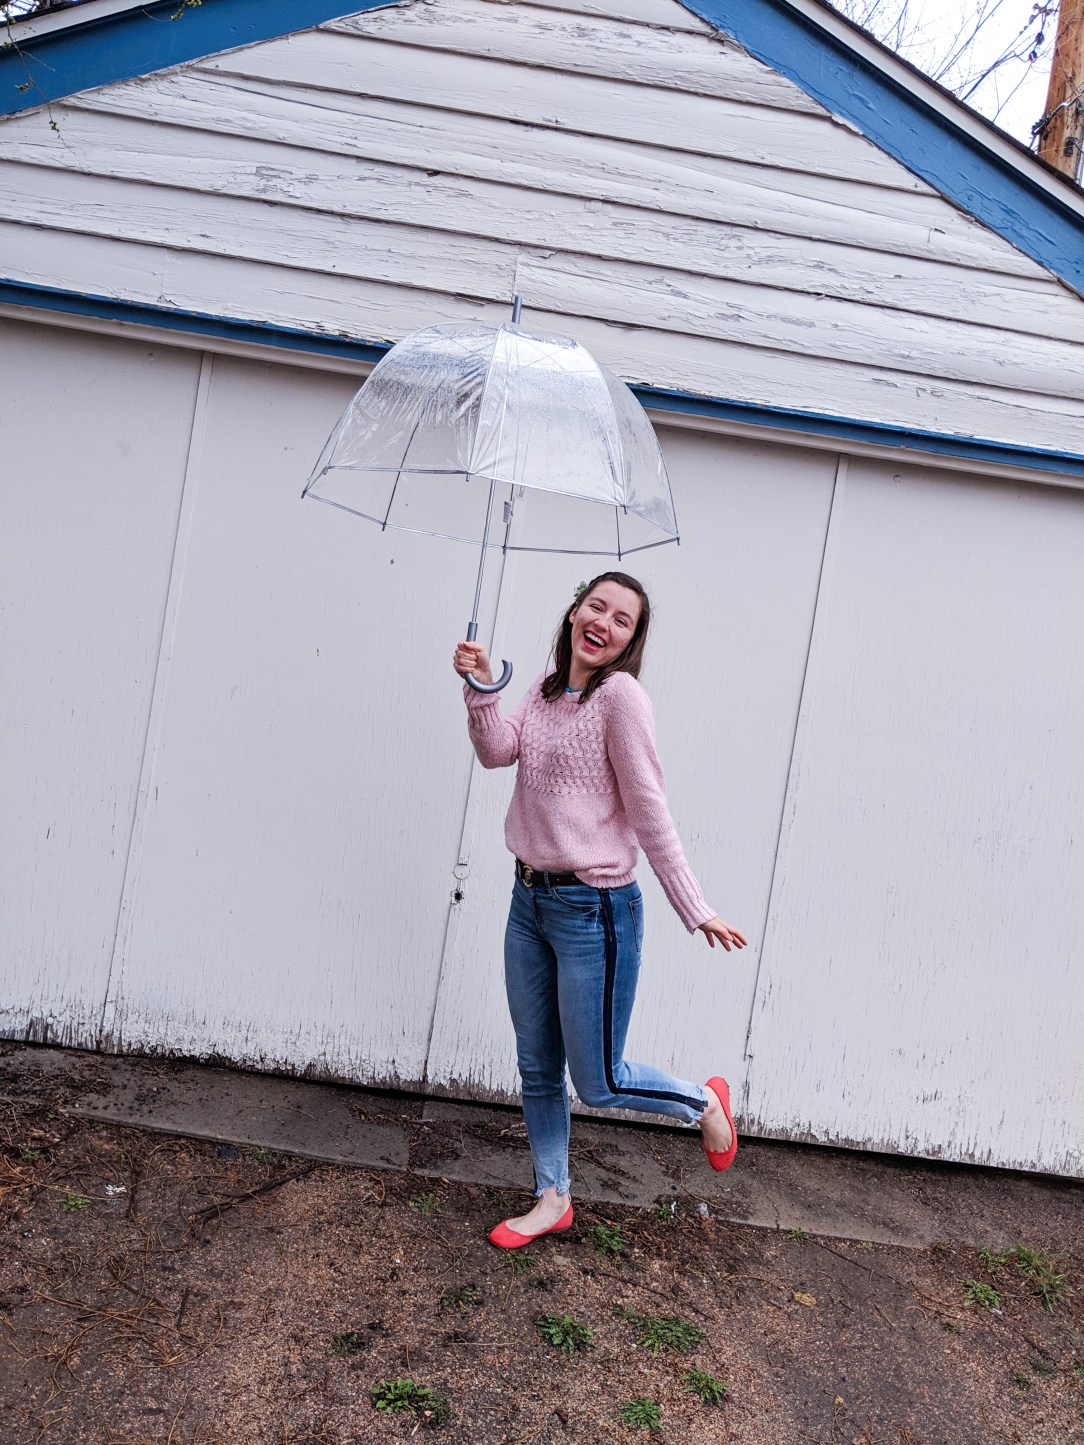 dancing in the rain, cute umbrella, orange shoes, pink sweater